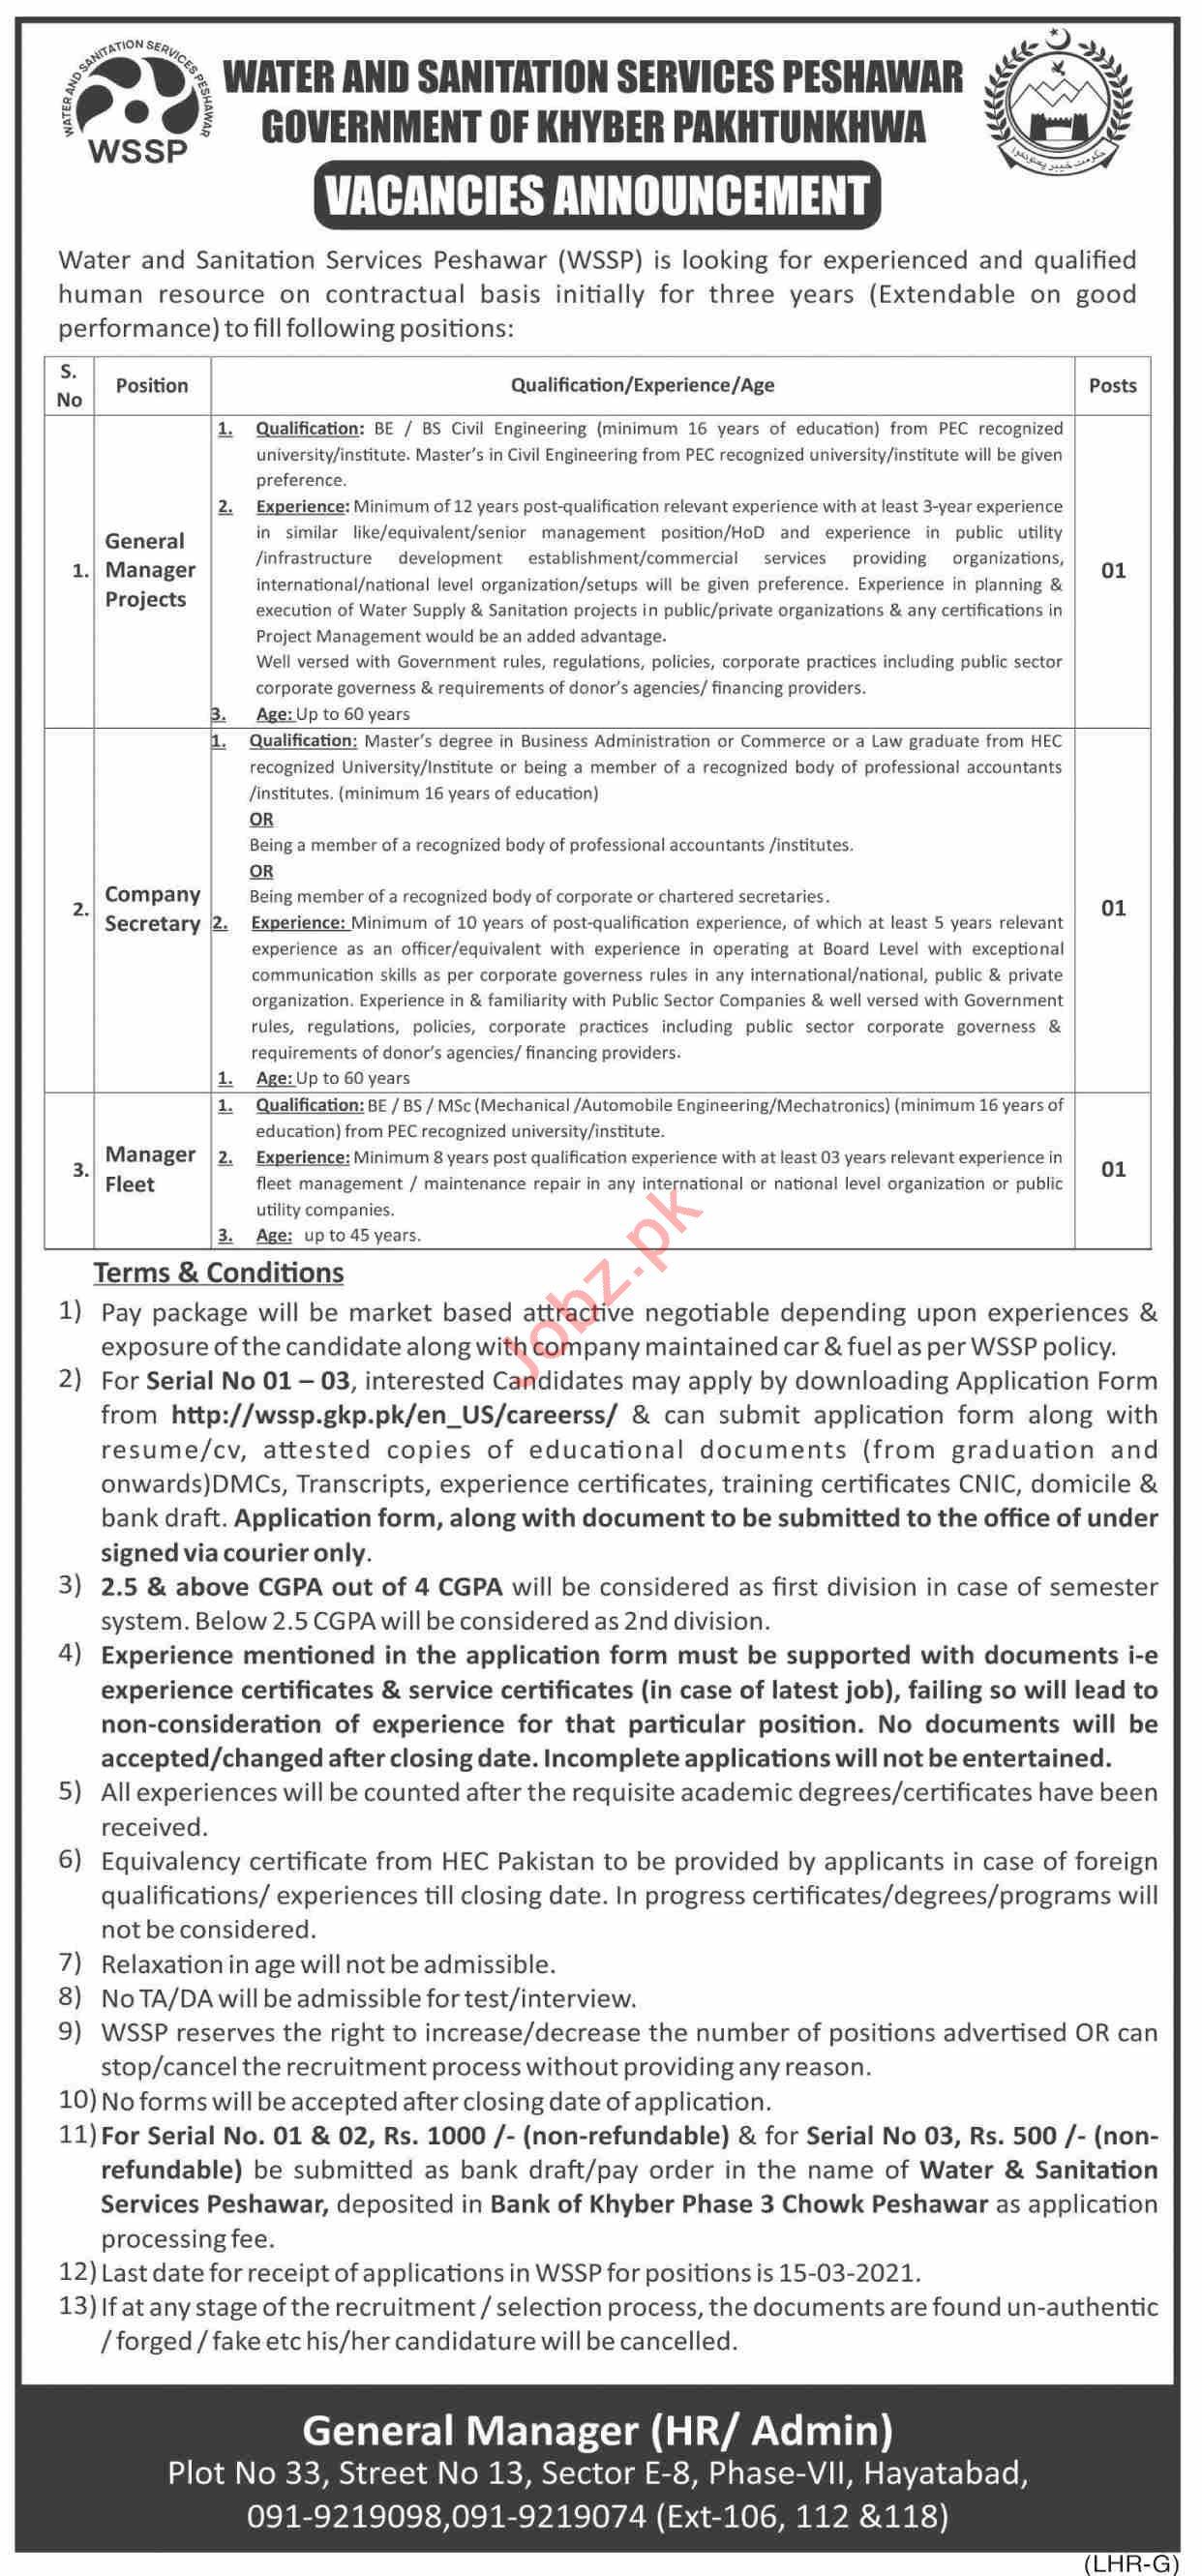 Water & Sanitation Services Peshawar WSSP Jobs 2021